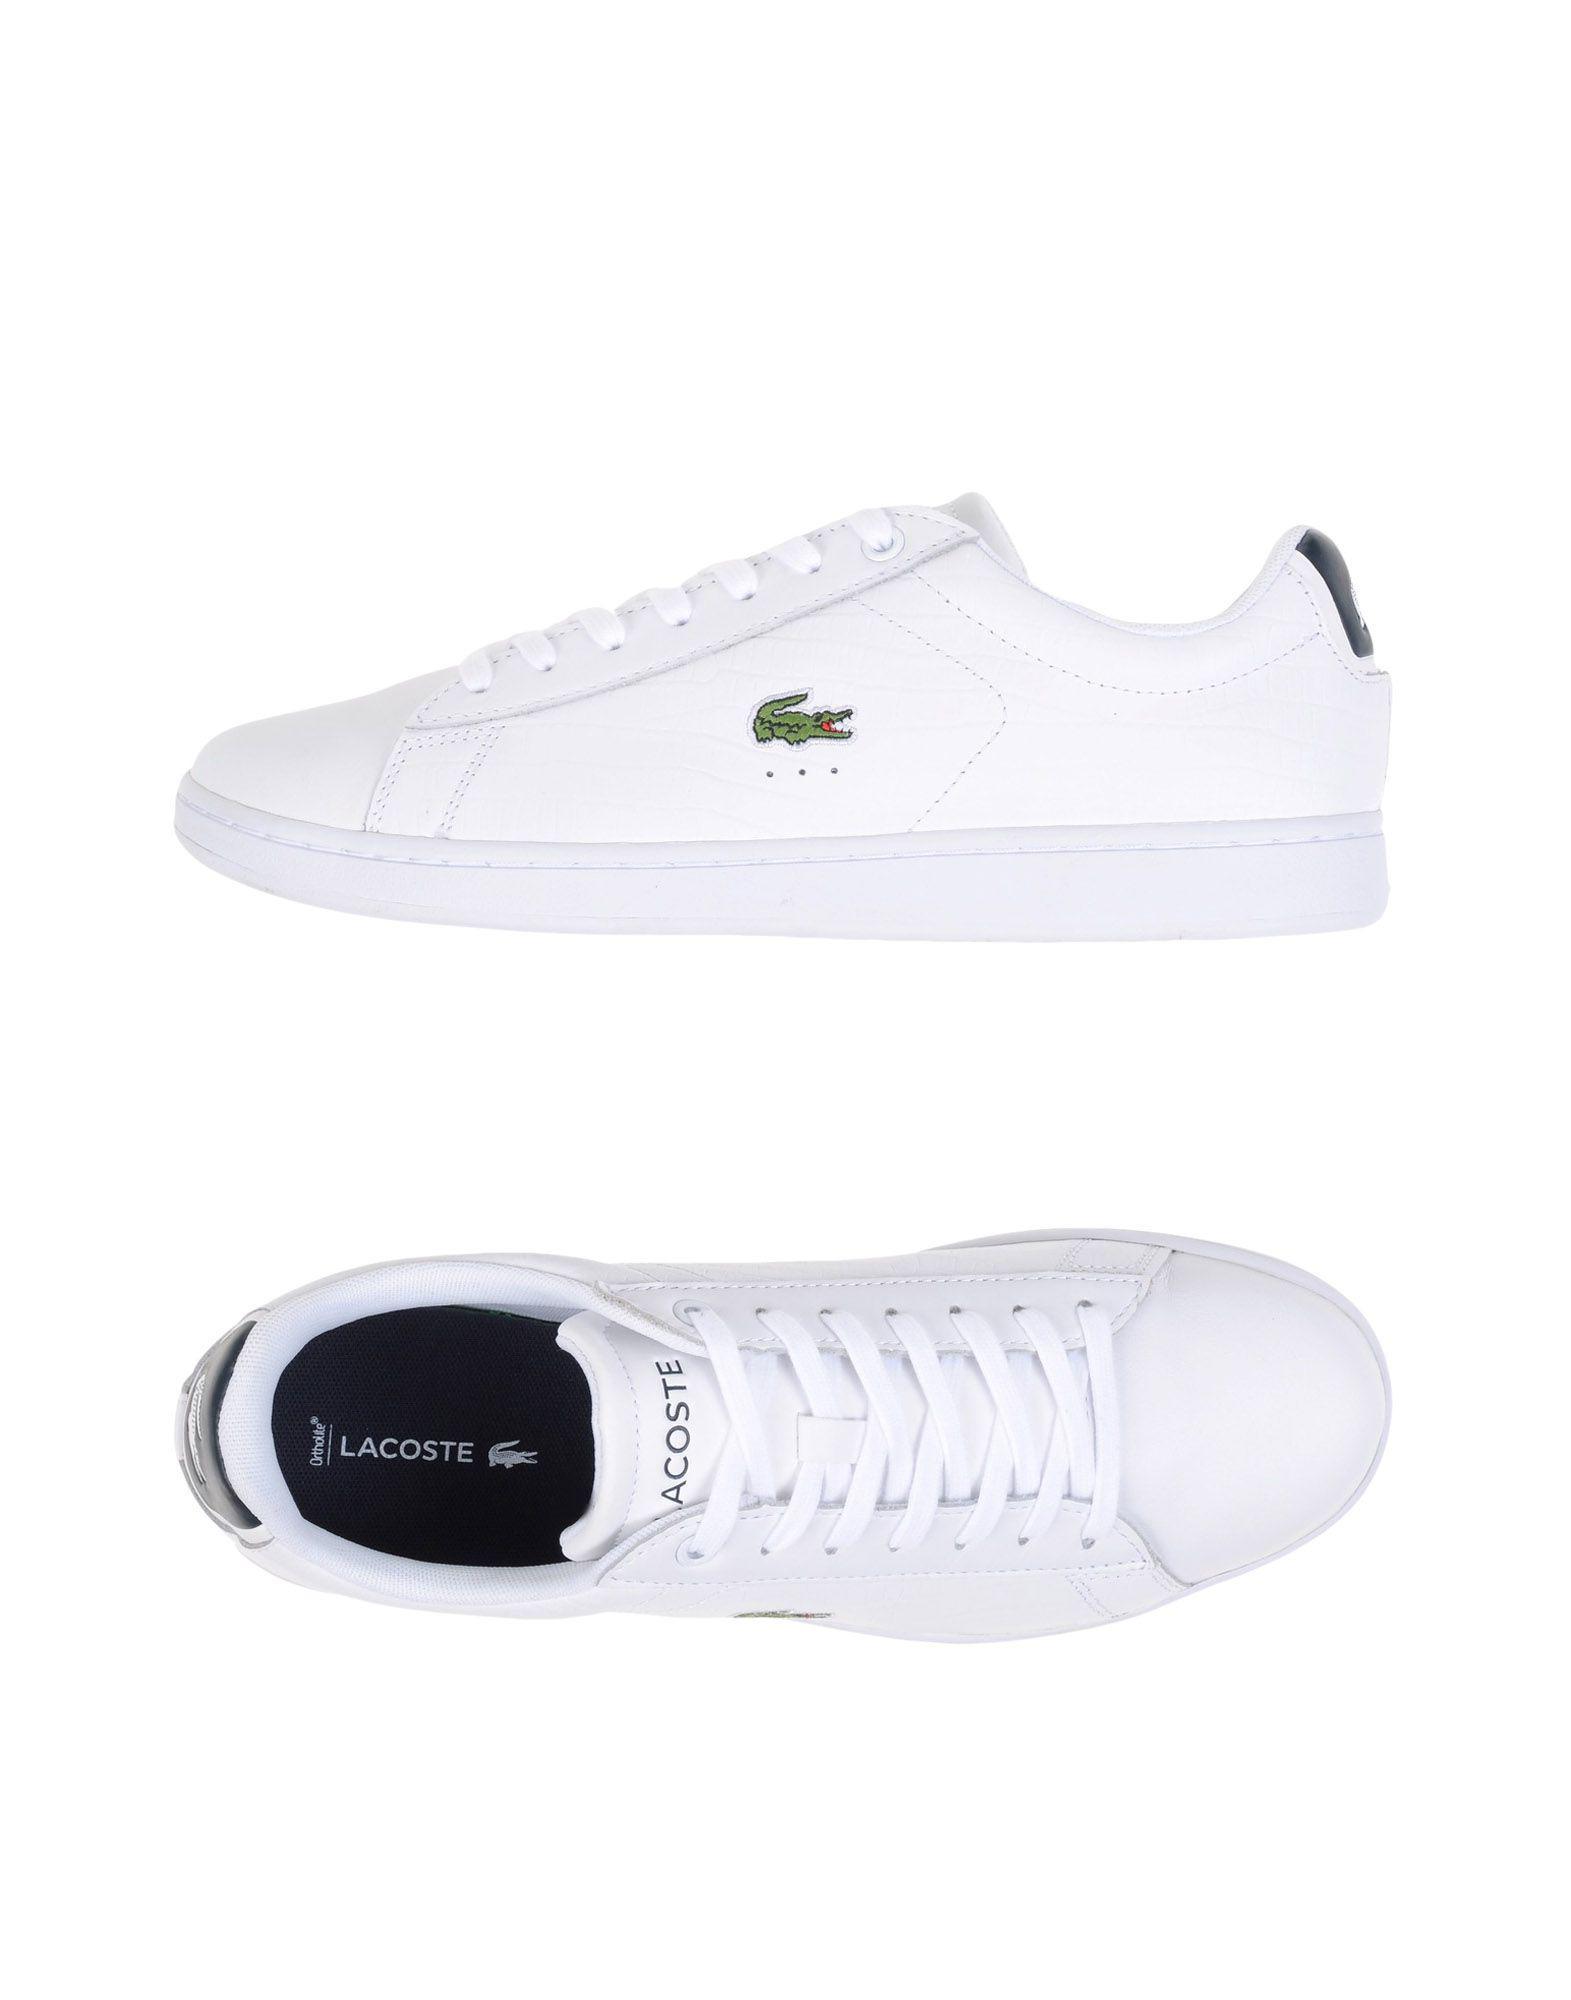 lacoste low top sneakers best c81f6 9bfa8